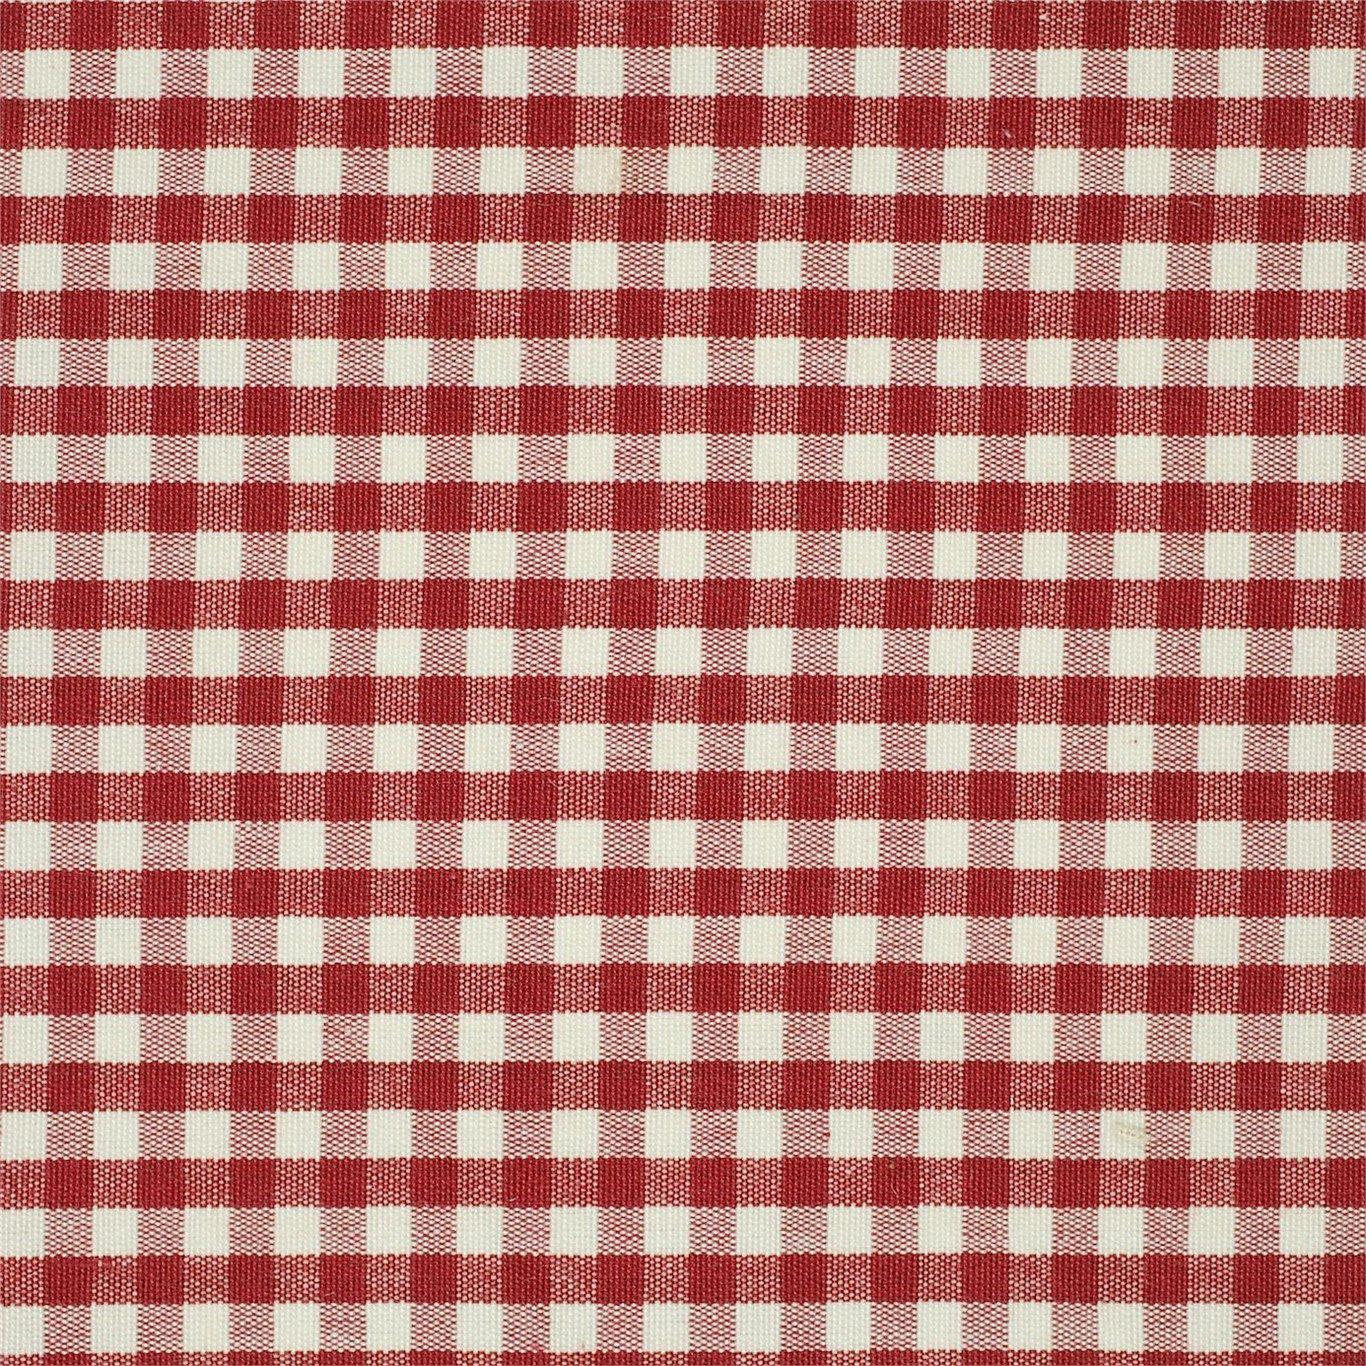 Products harlequin designer fabrics and wallpapers paradise - Products Harlequin Designer Fabrics And Wallpapers Lollipop Hcd06057 Bonbon Fabrics